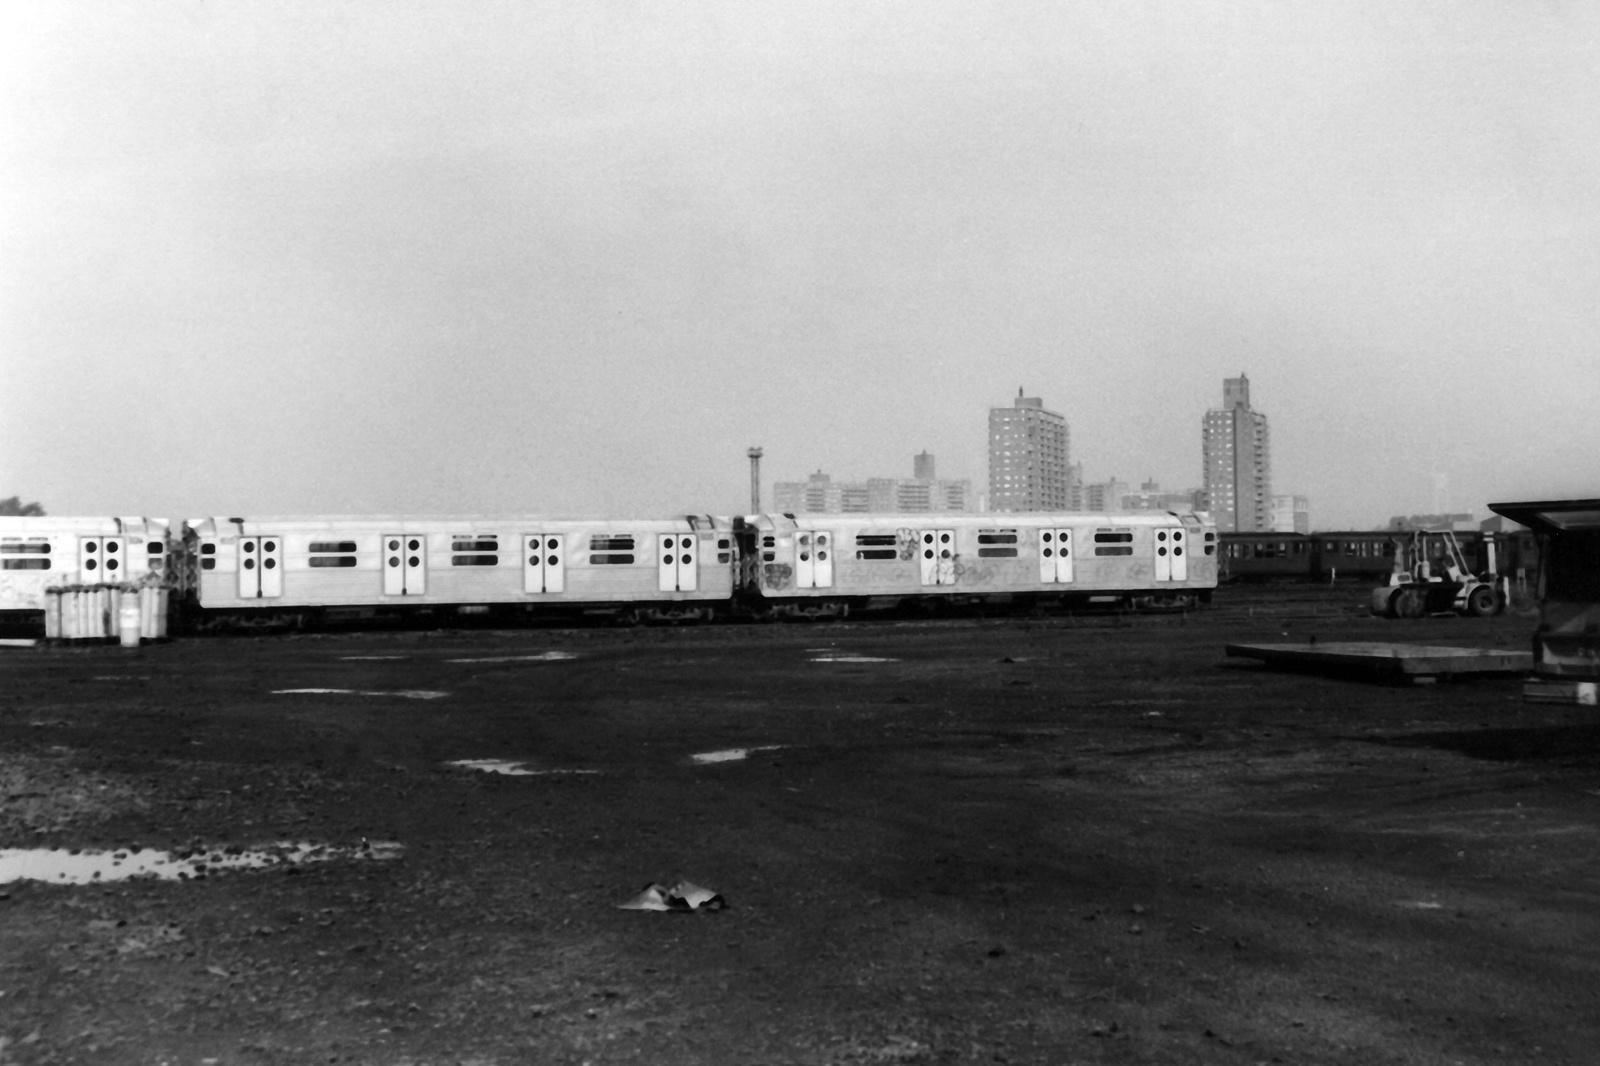 (367k, 1600x1066)<br><b>Country:</b> United States<br><b>City:</b> New York<br><b>System:</b> New York City Transit<br><b>Location:</b> Coney Island Yard<br><b>Car:</b> R-11 (Budd, 1949)  <br><b>Collection of:</b> Nicholas Fabrizio<br><b>Viewed (this week/total):</b> 2 / 269